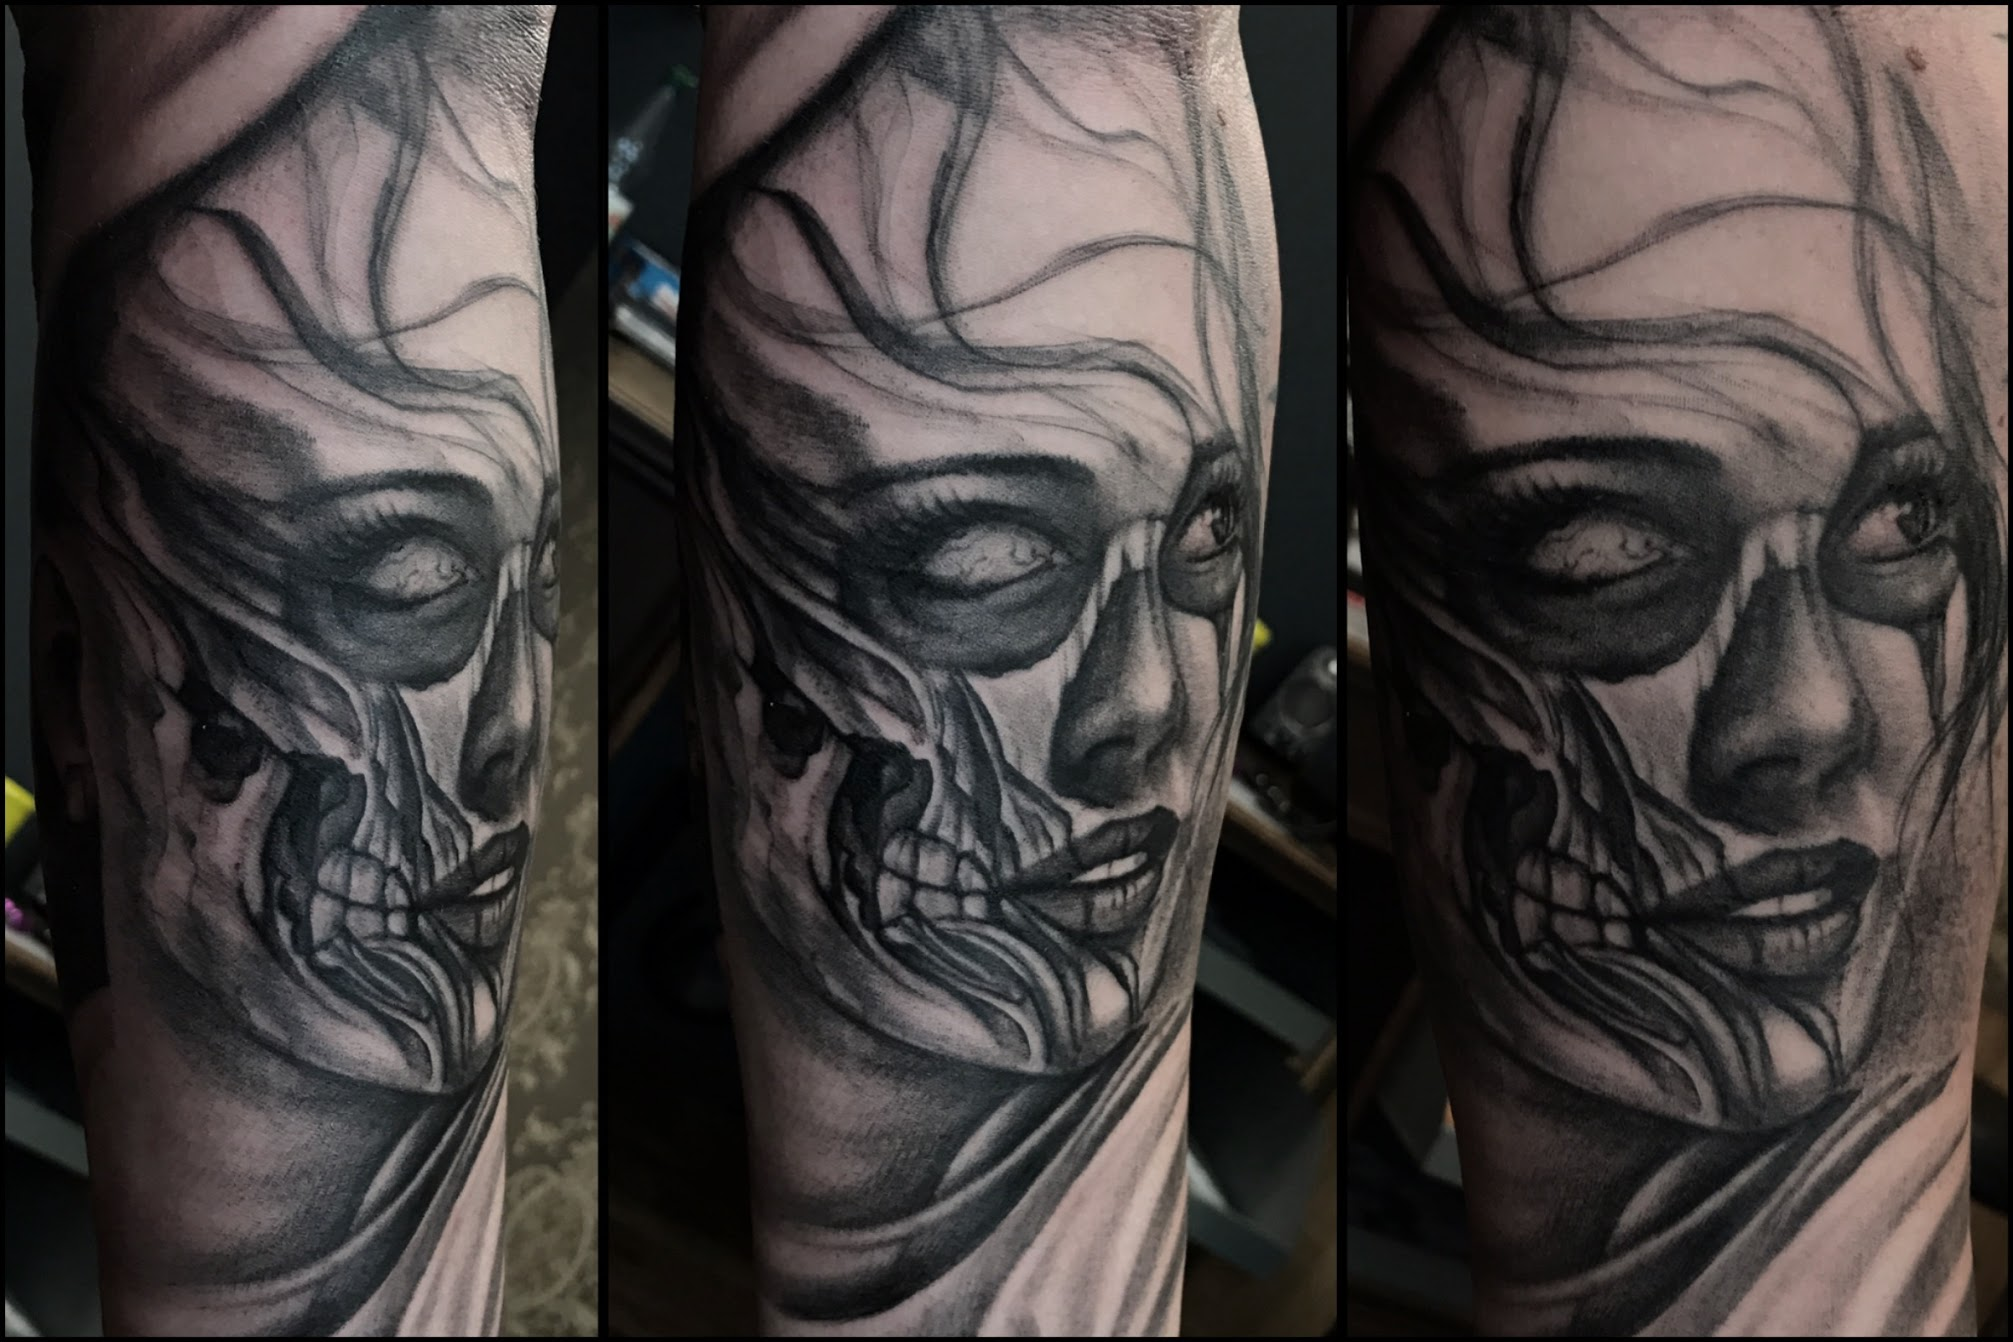 Tattoo-Gesicht-Totenkopf-Frau